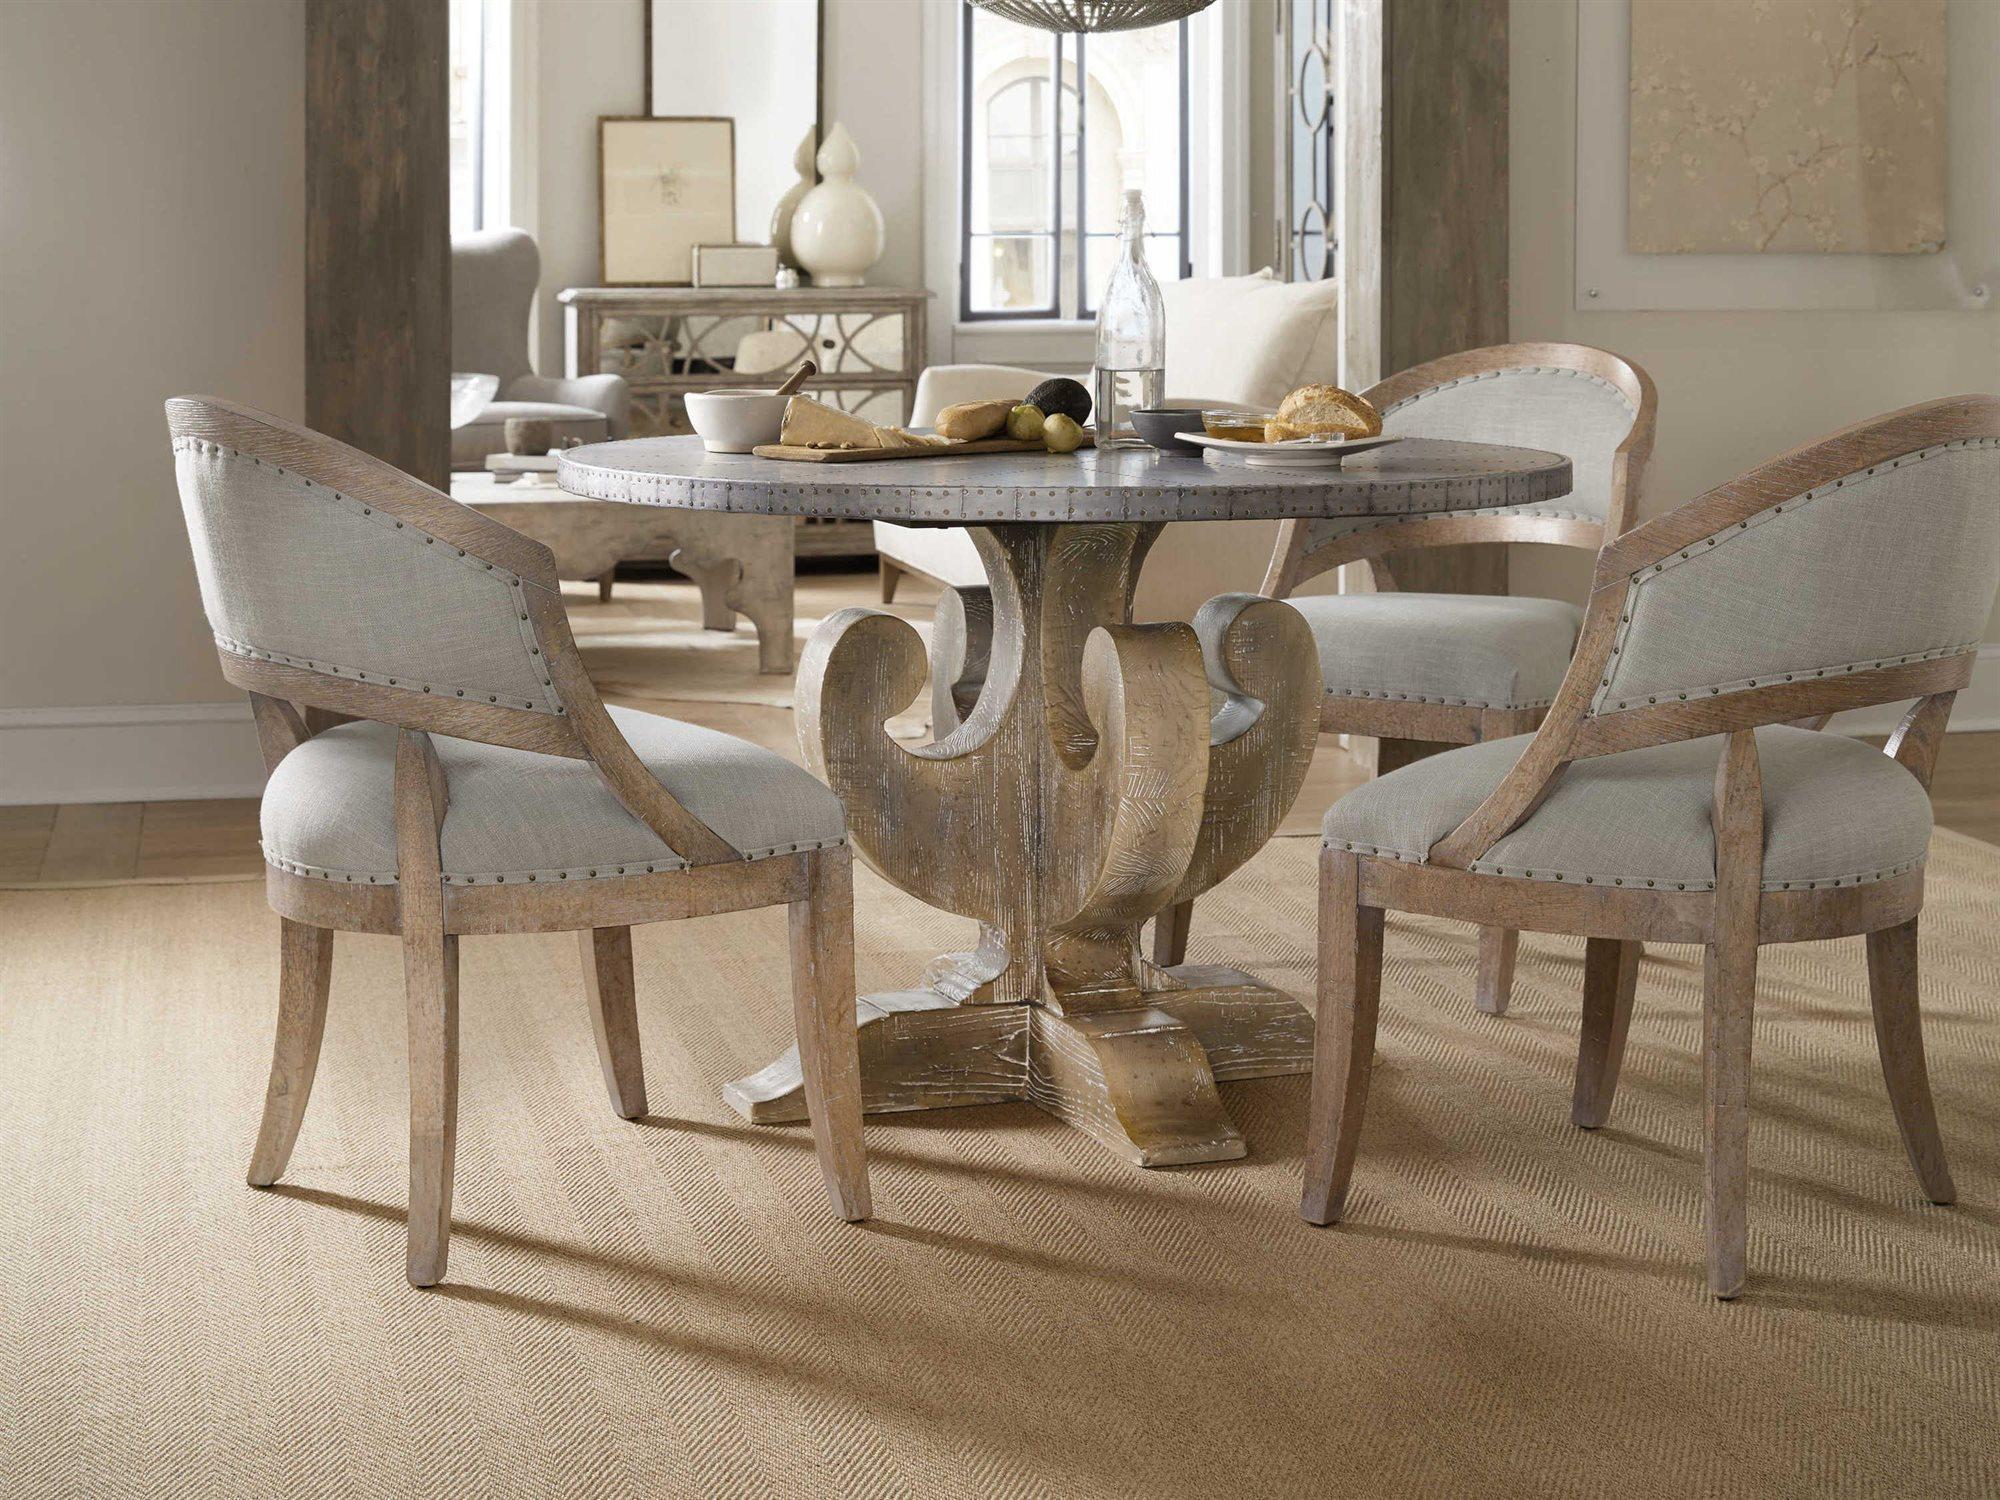 Hooker Furniture Boheme Zinc Light Wood 48 Wide Round Dining Table Hoo575075203slv